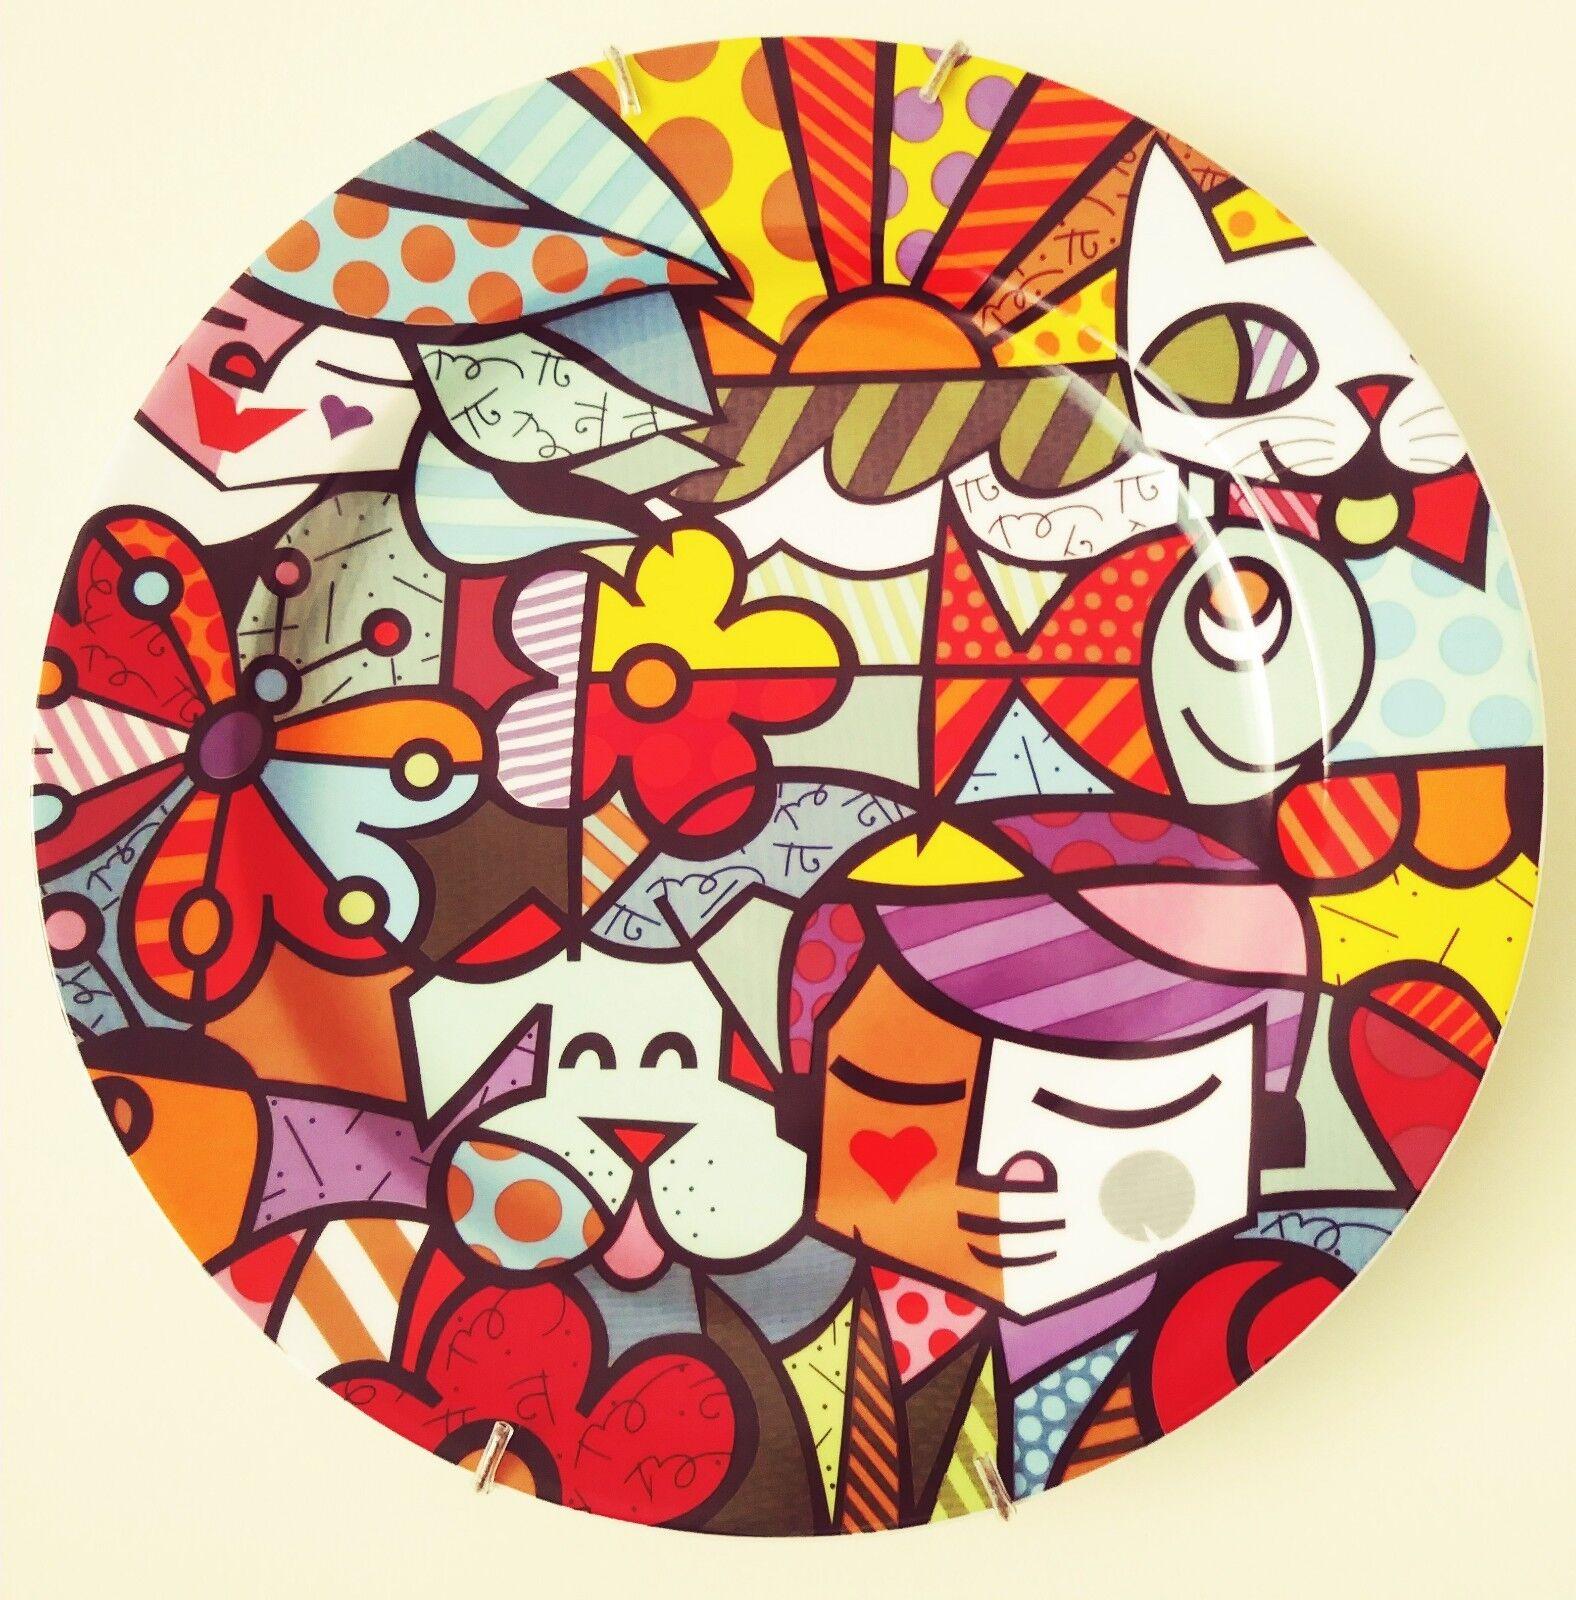 ROMERO BRITTO x Vista Alegre 'Garden' Porcelain Collector's Plate 12-5 8  NEW